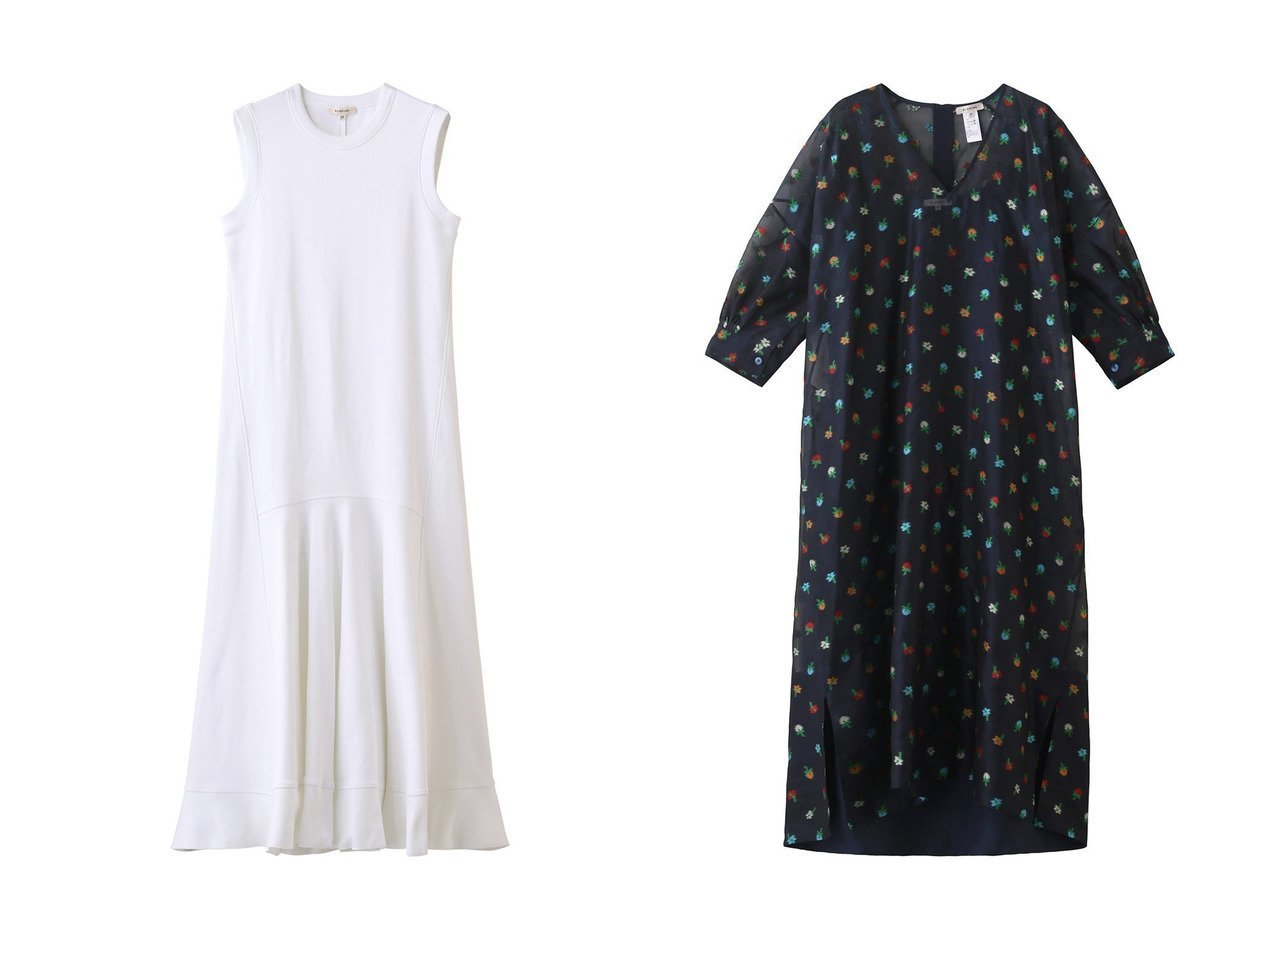 【BLAMINK/ブラミンク】のコットンリブノースリーブワンピース&シルクポリエステルフラワージャガードVネックワンピース 【ワンピース・ドレス】おすすめ!人気、トレンド・レディースファッションの通販 おすすめで人気の流行・トレンド、ファッションの通販商品 メンズファッション・キッズファッション・インテリア・家具・レディースファッション・服の通販 founy(ファニー) https://founy.com/ ファッション Fashion レディースファッション WOMEN ワンピース Dress S/S・春夏 SS・Spring/Summer インナー ノースリーブ フィット ロング 春 Spring アンダー ドレス 今季  ID:crp329100000038632